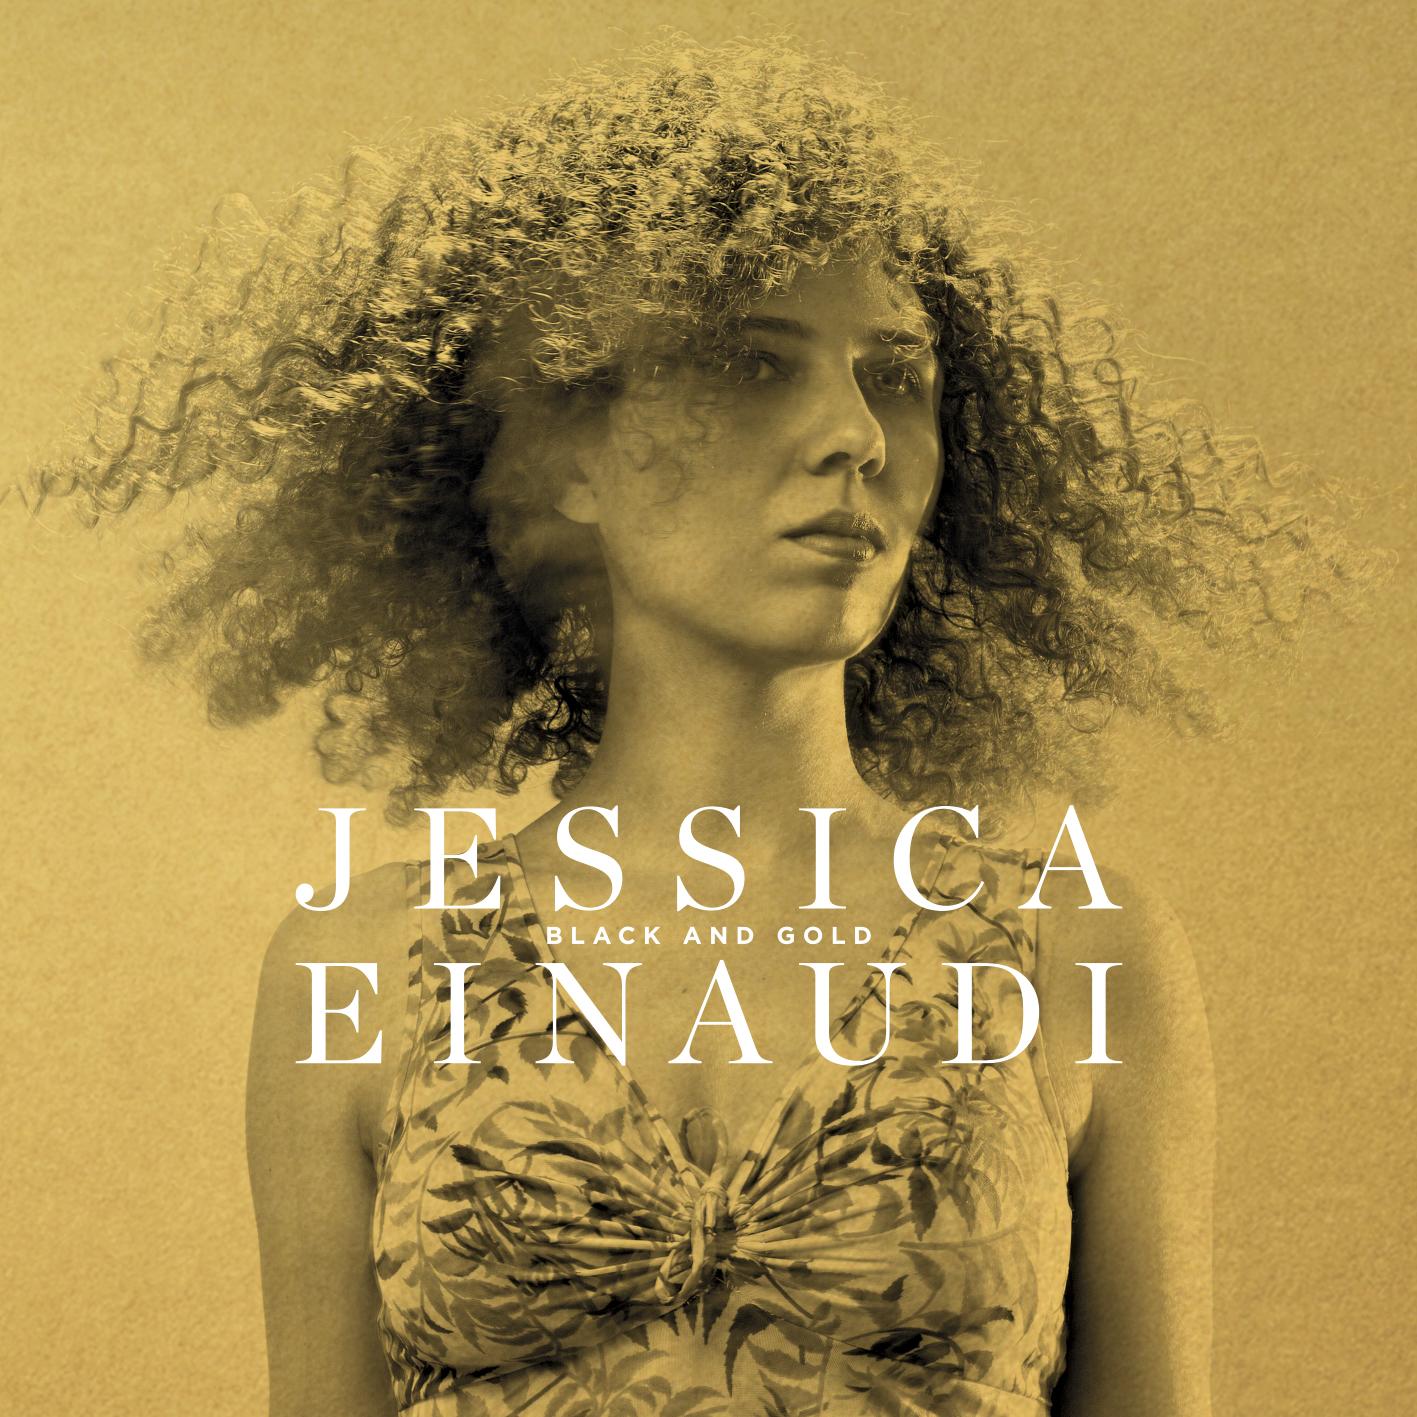 BLACK AND GOLD by Jessica Einaudi